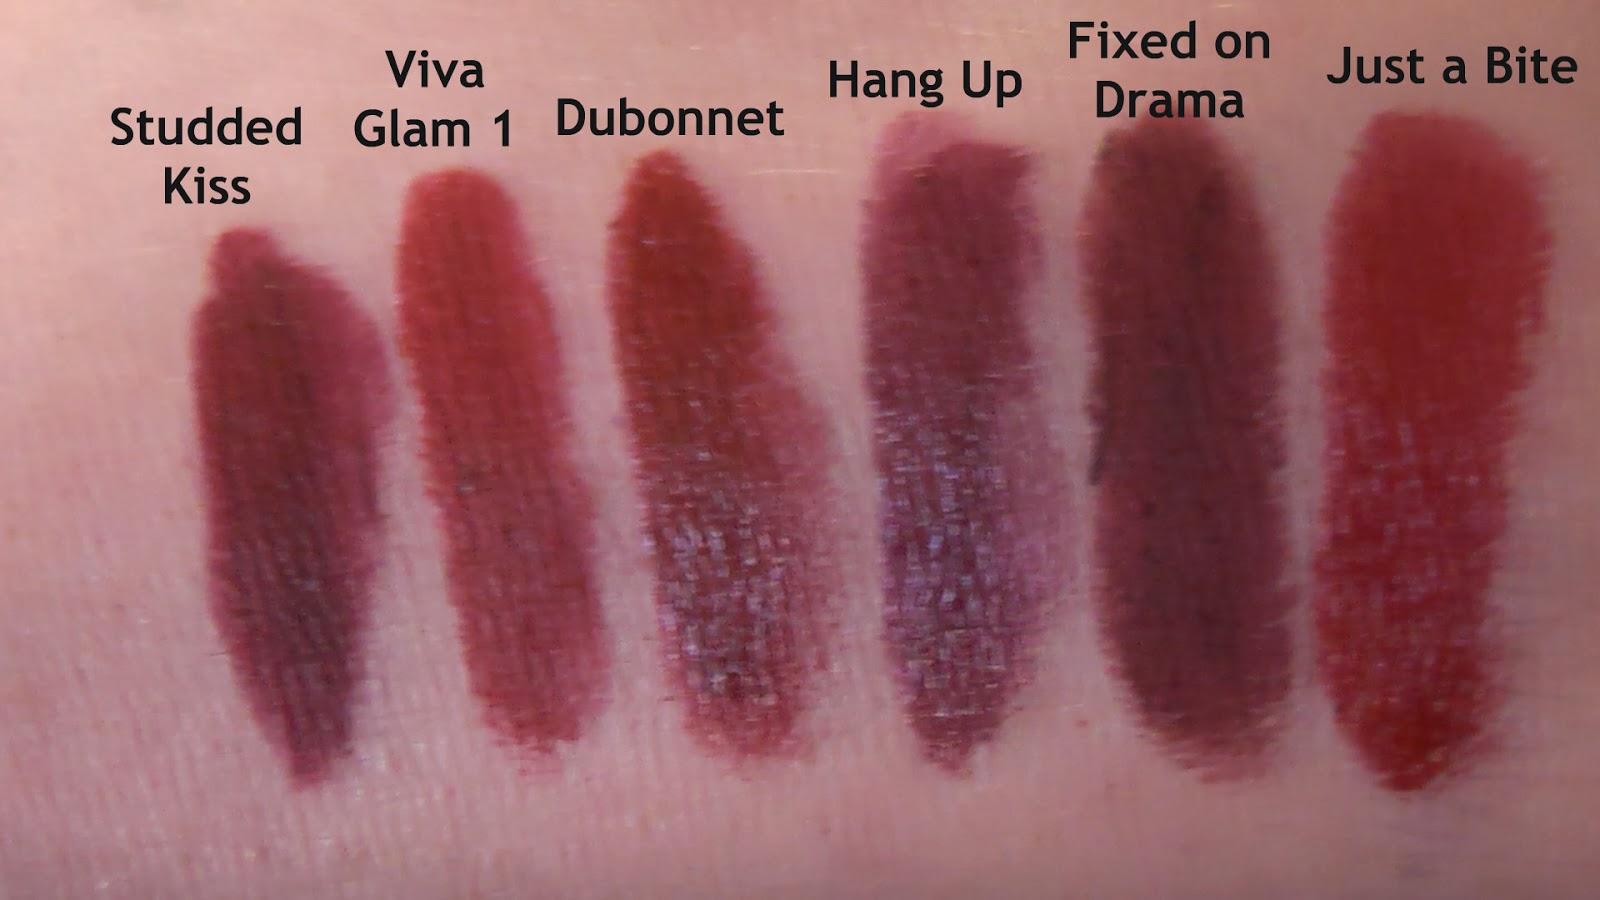 Bien connu UNAPOLOGETIC: MAC Punk Couture Lipstick Haul (comparison and swatches) AZ84